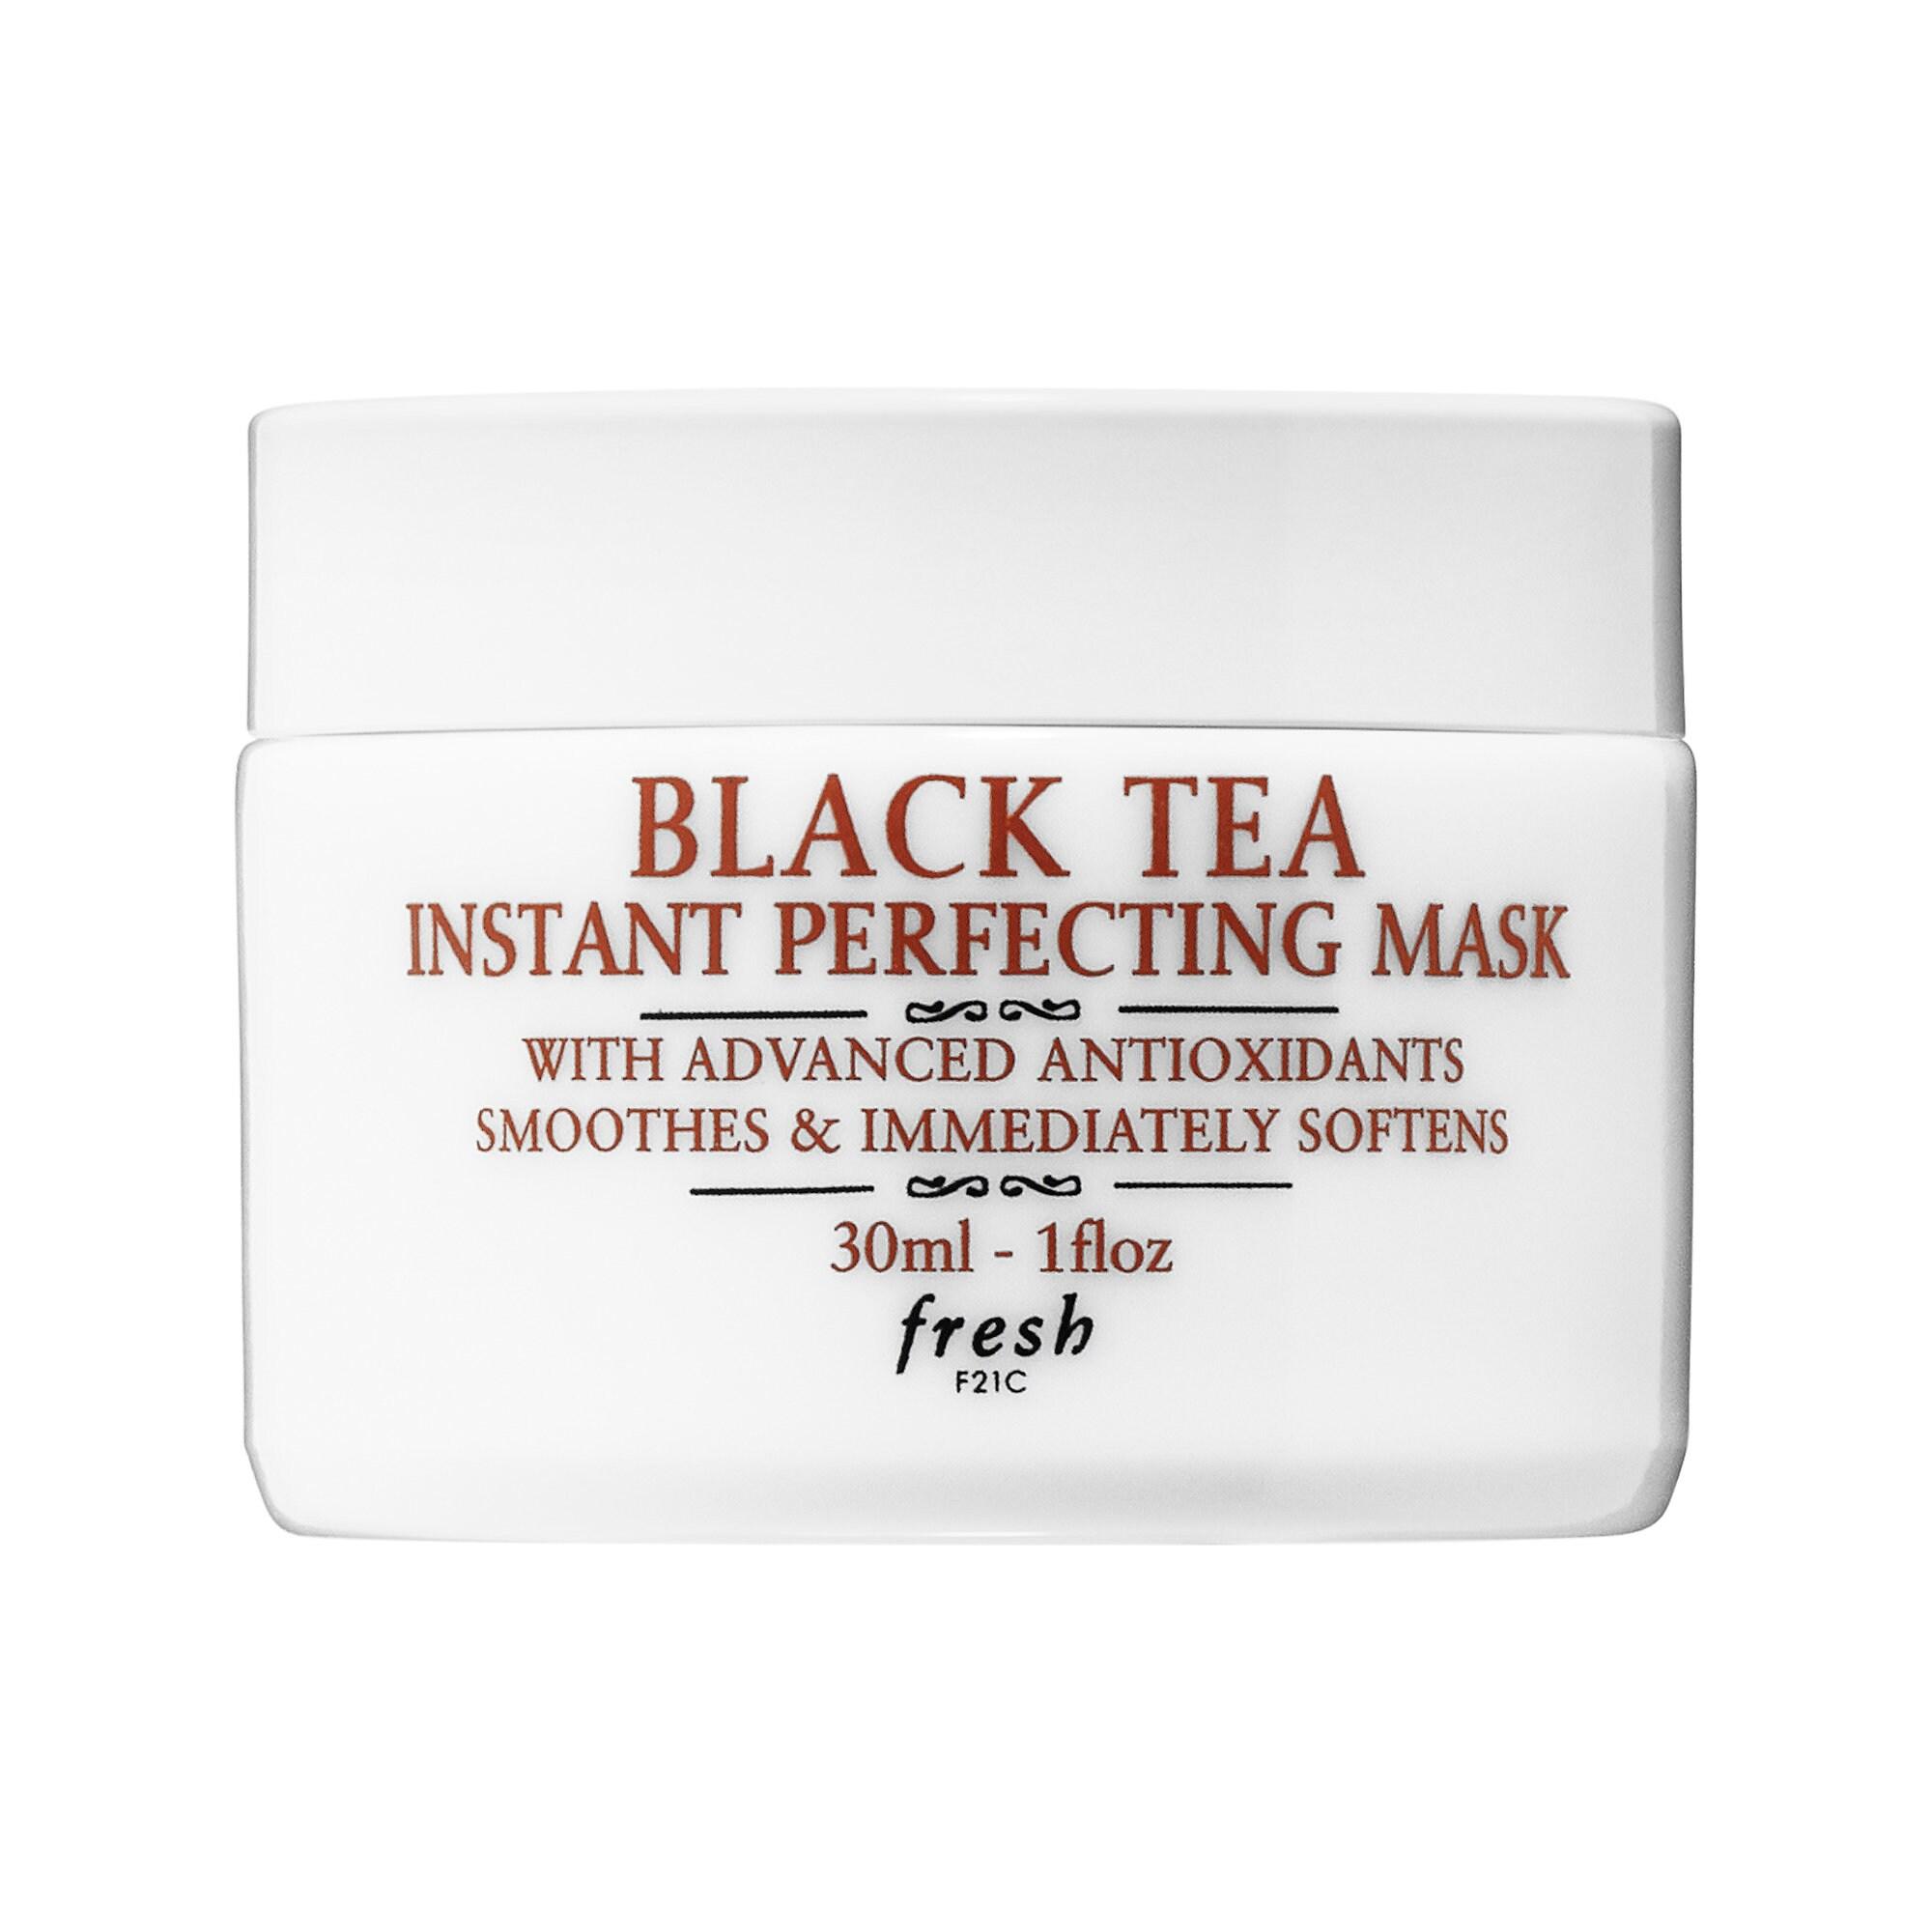 Fresh - Black Tea Instant Hydrating Face Mask